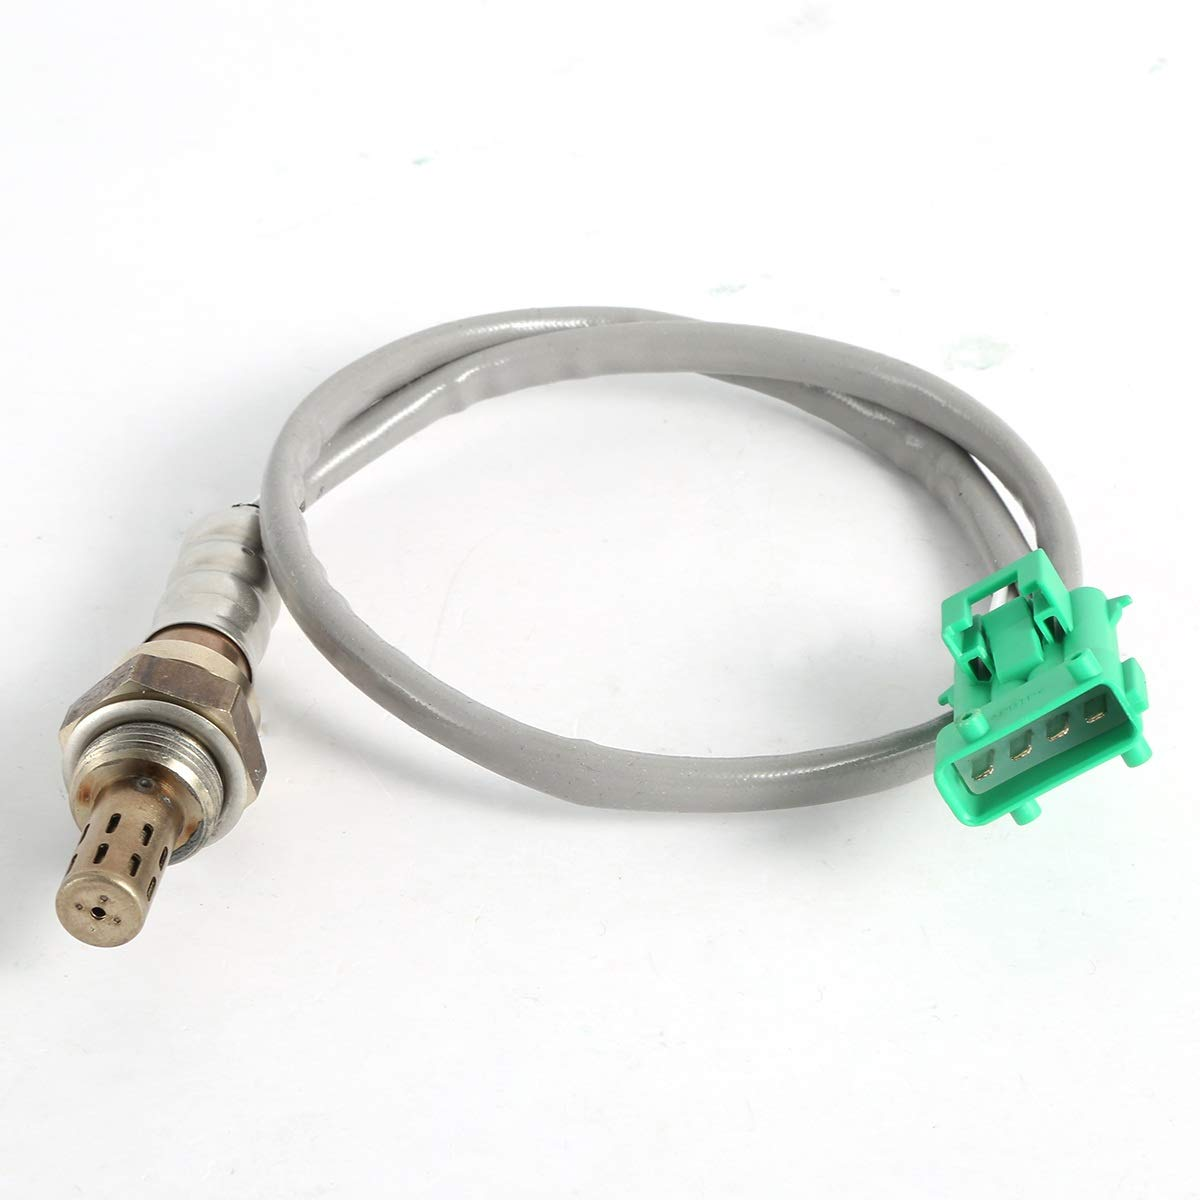 O2 Lambda Probes 4-Pins Oxygen O2 Lambda Probes Sensor For Peugeot 106 206 207 306 406